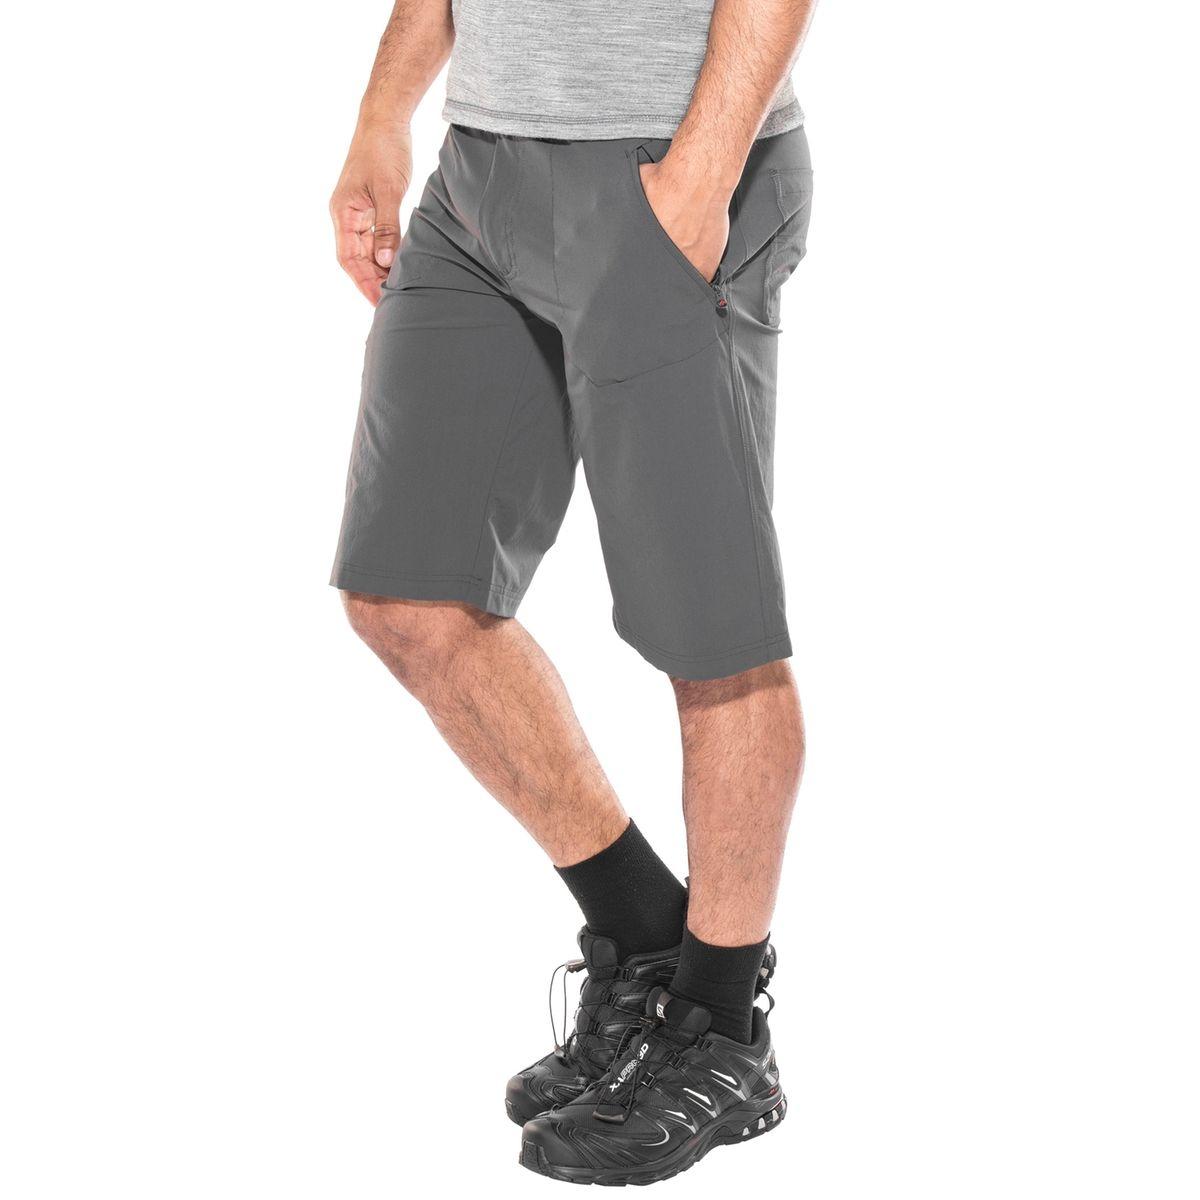 Nil - Shorts Homme - gris